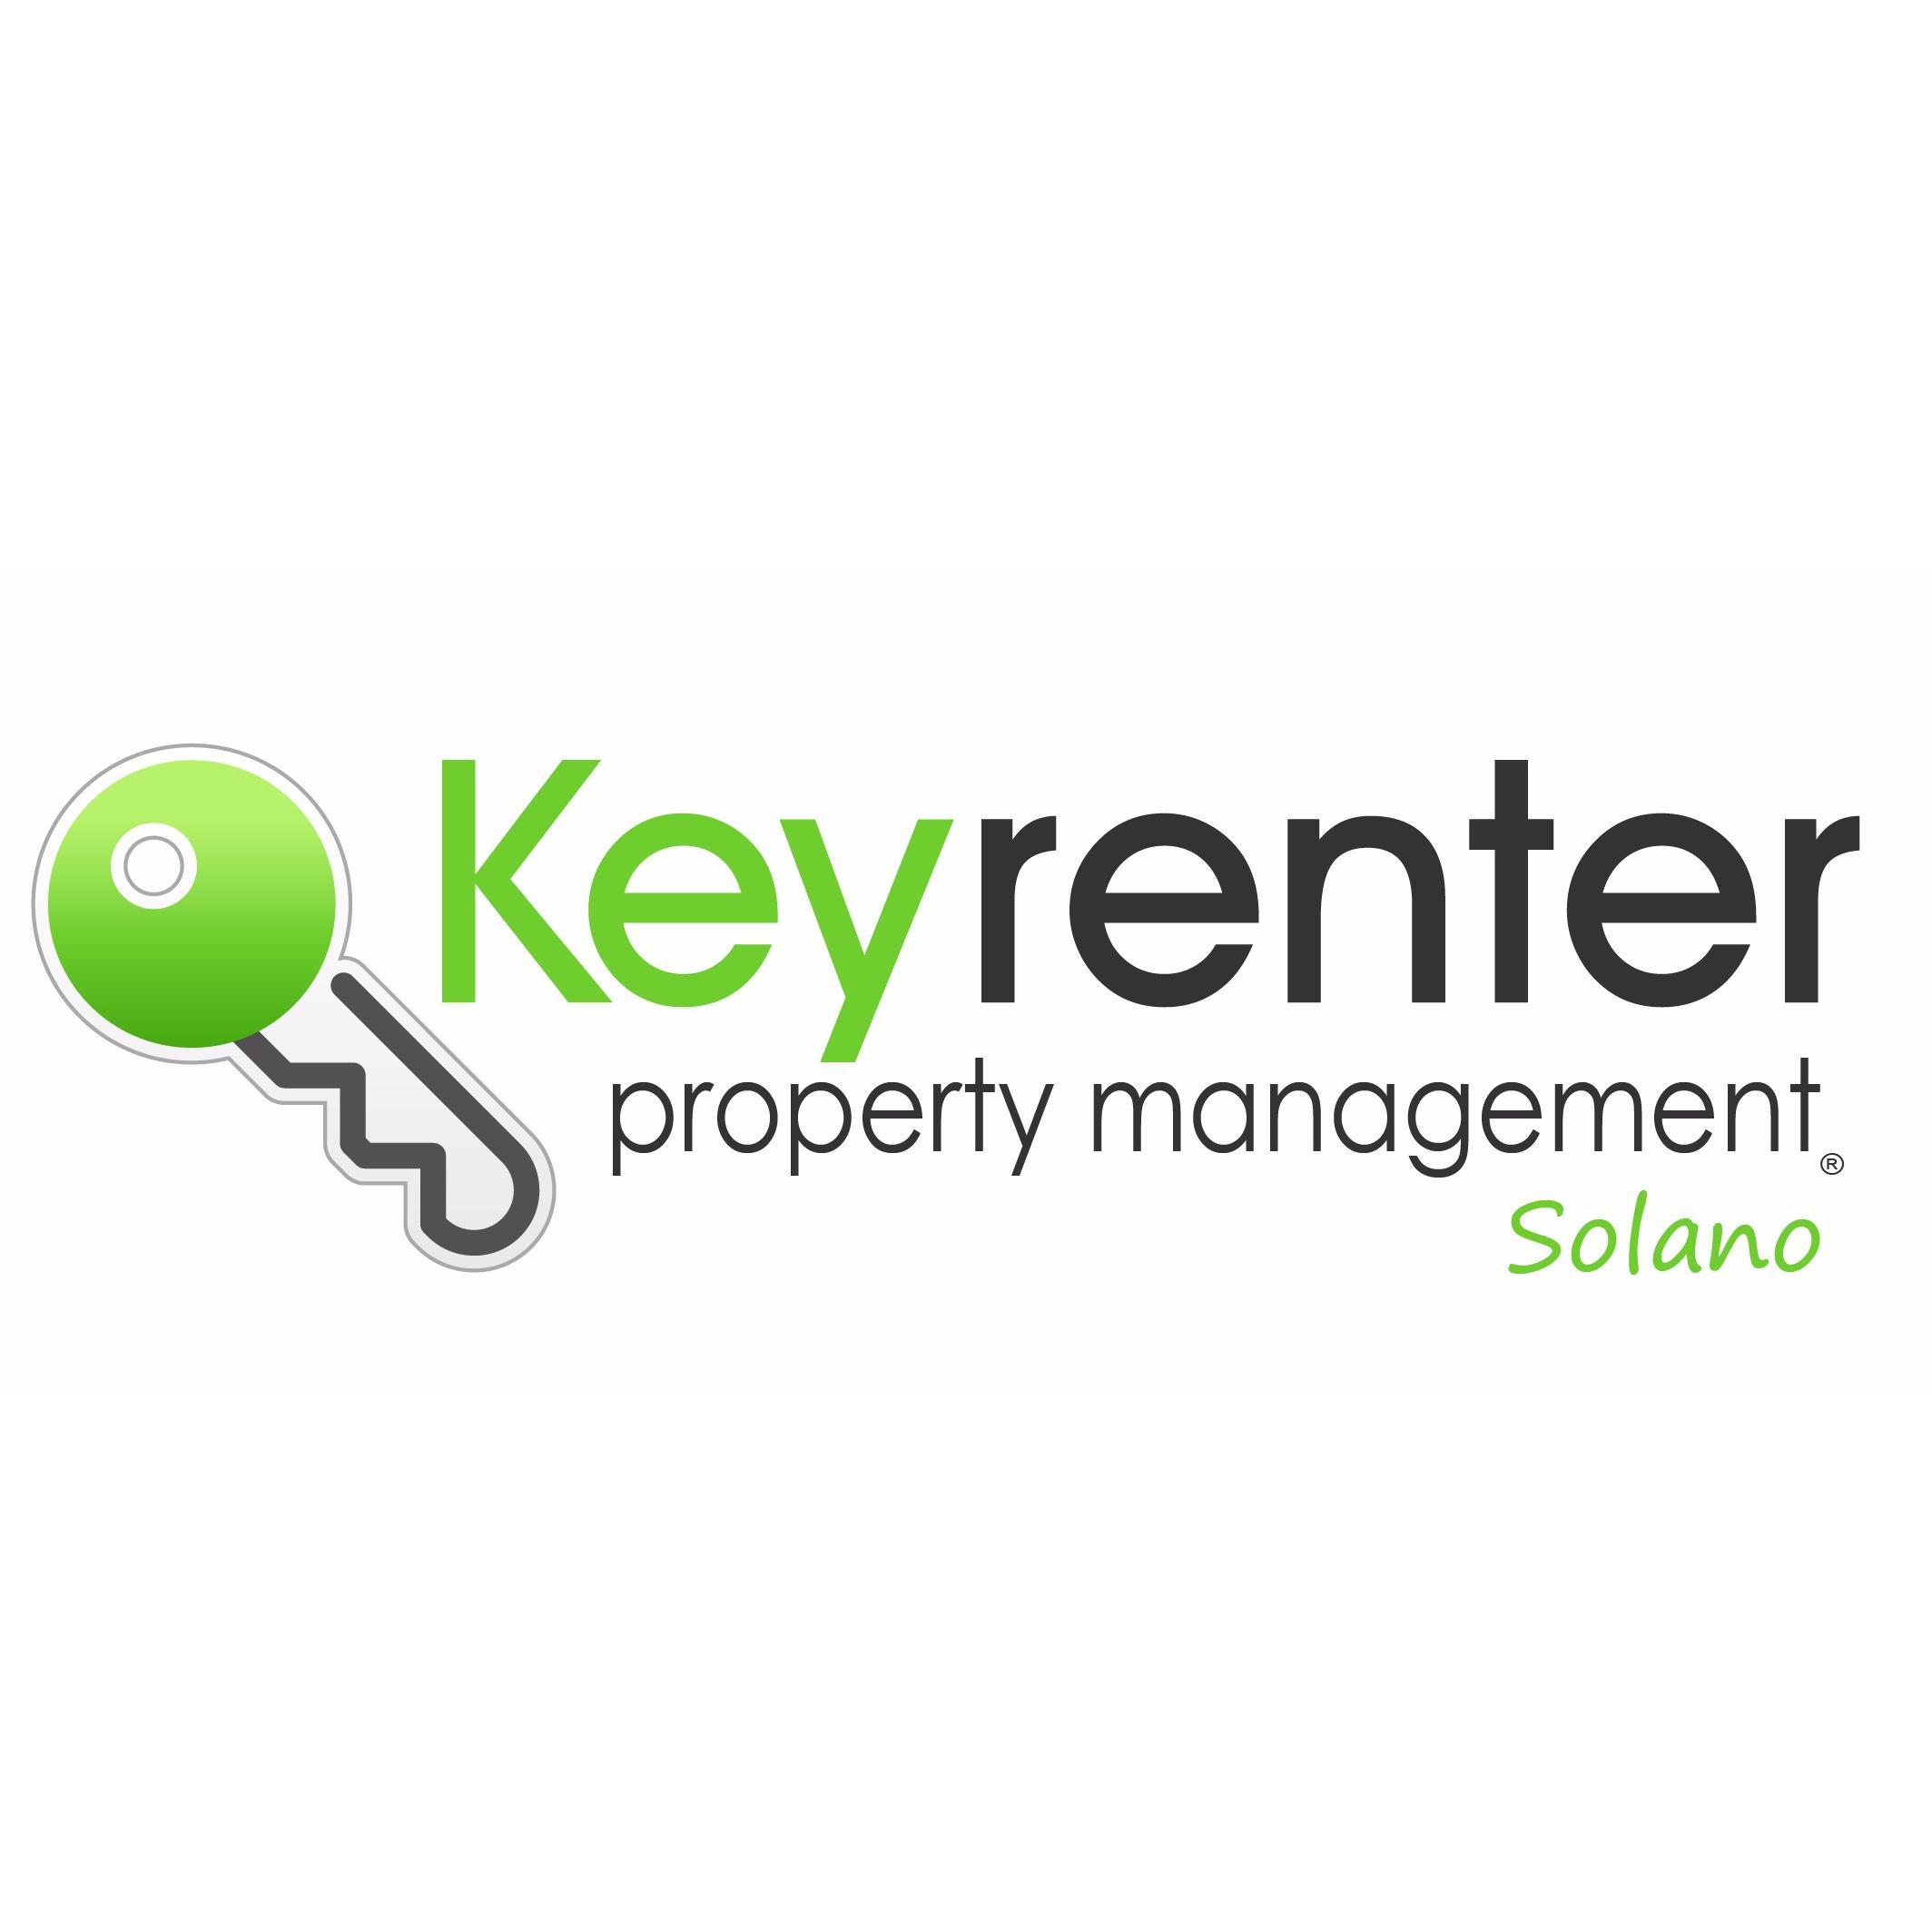 Keyrenter Property Management Solano